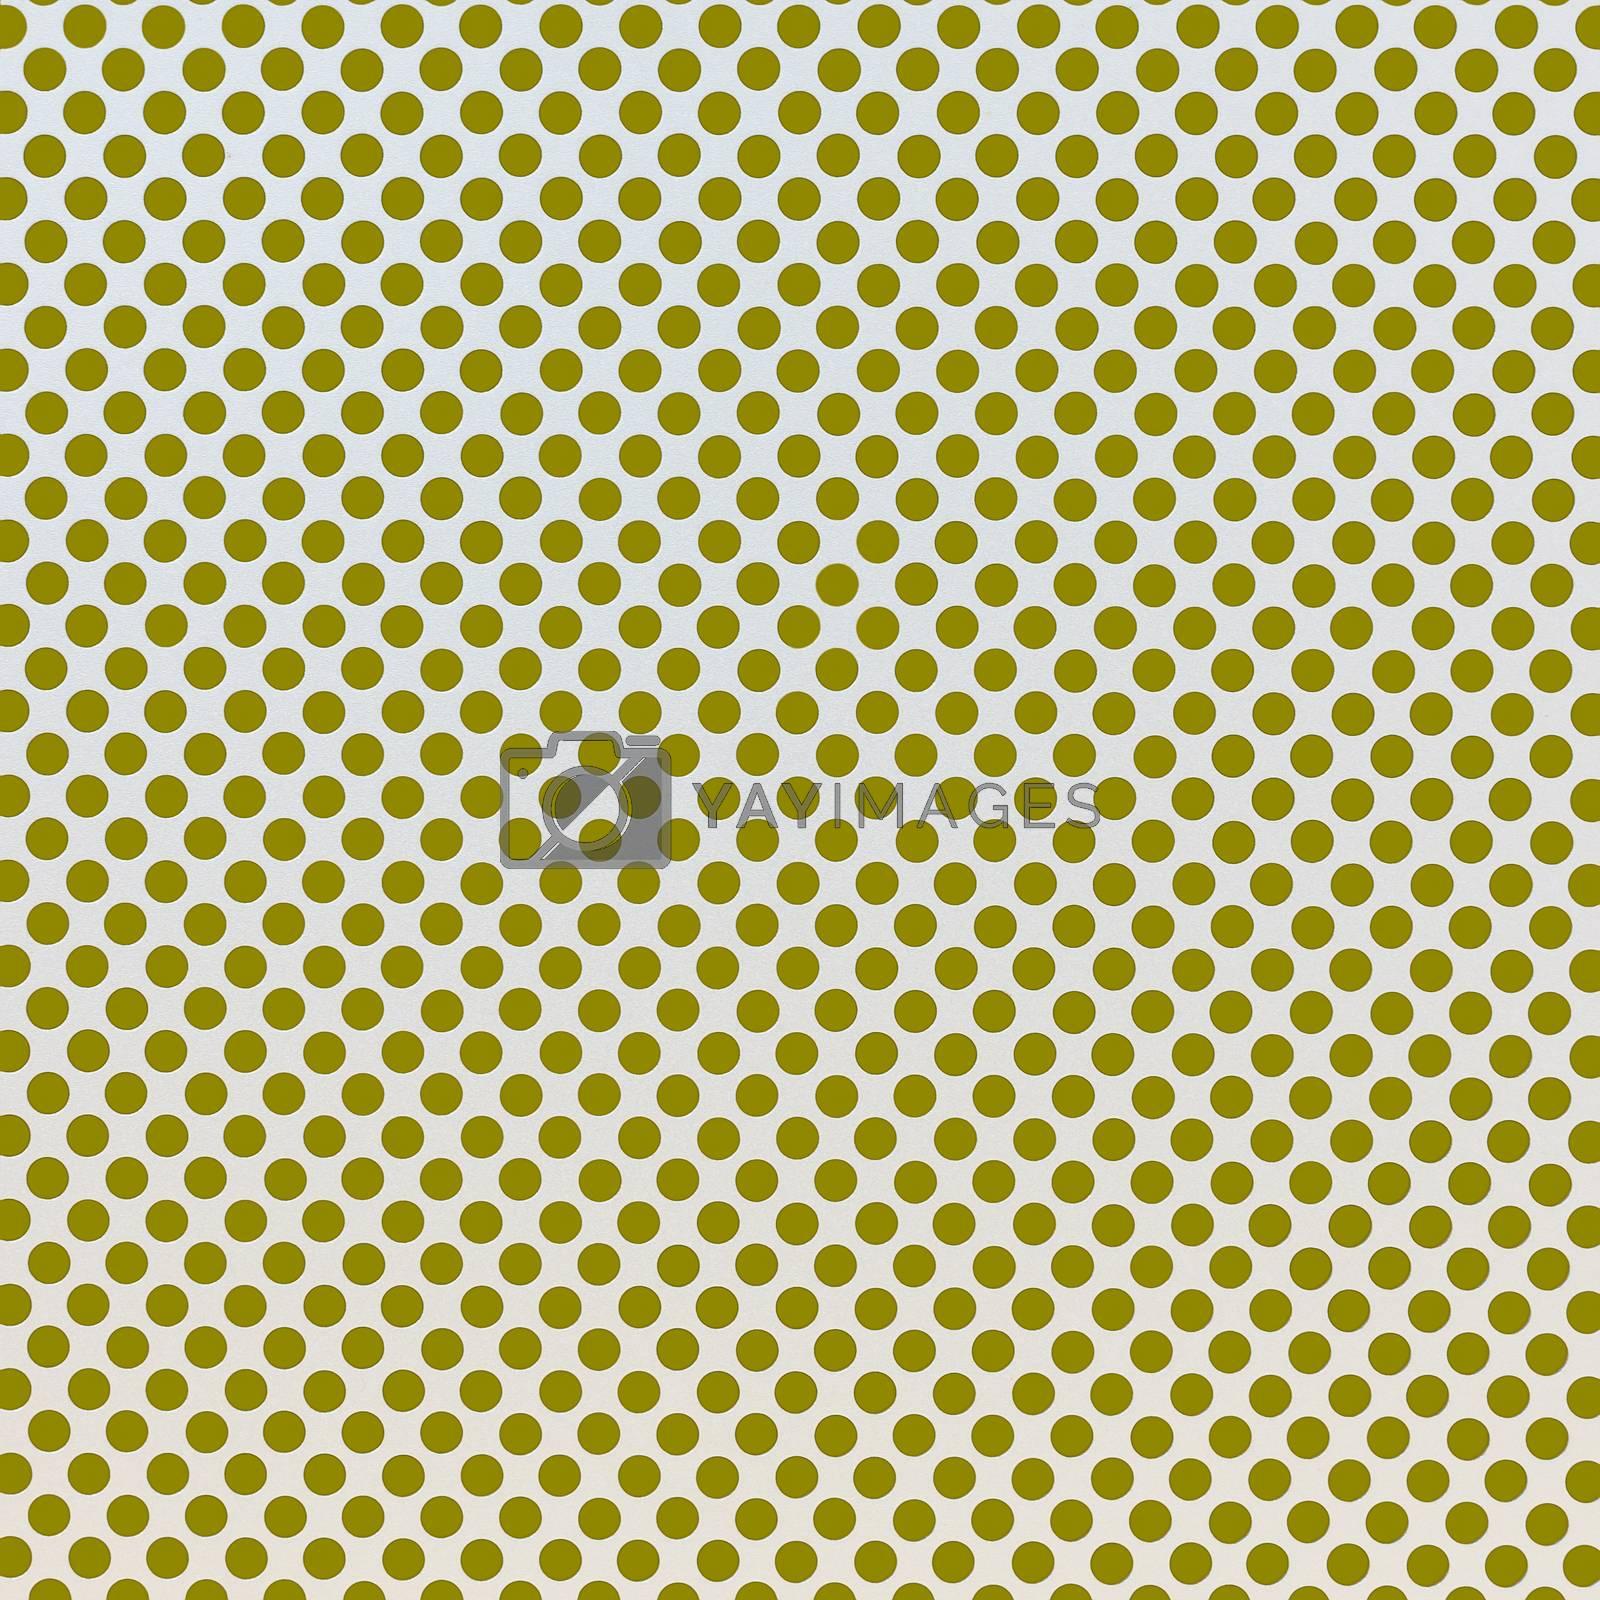 metal texture background by FrameAngel